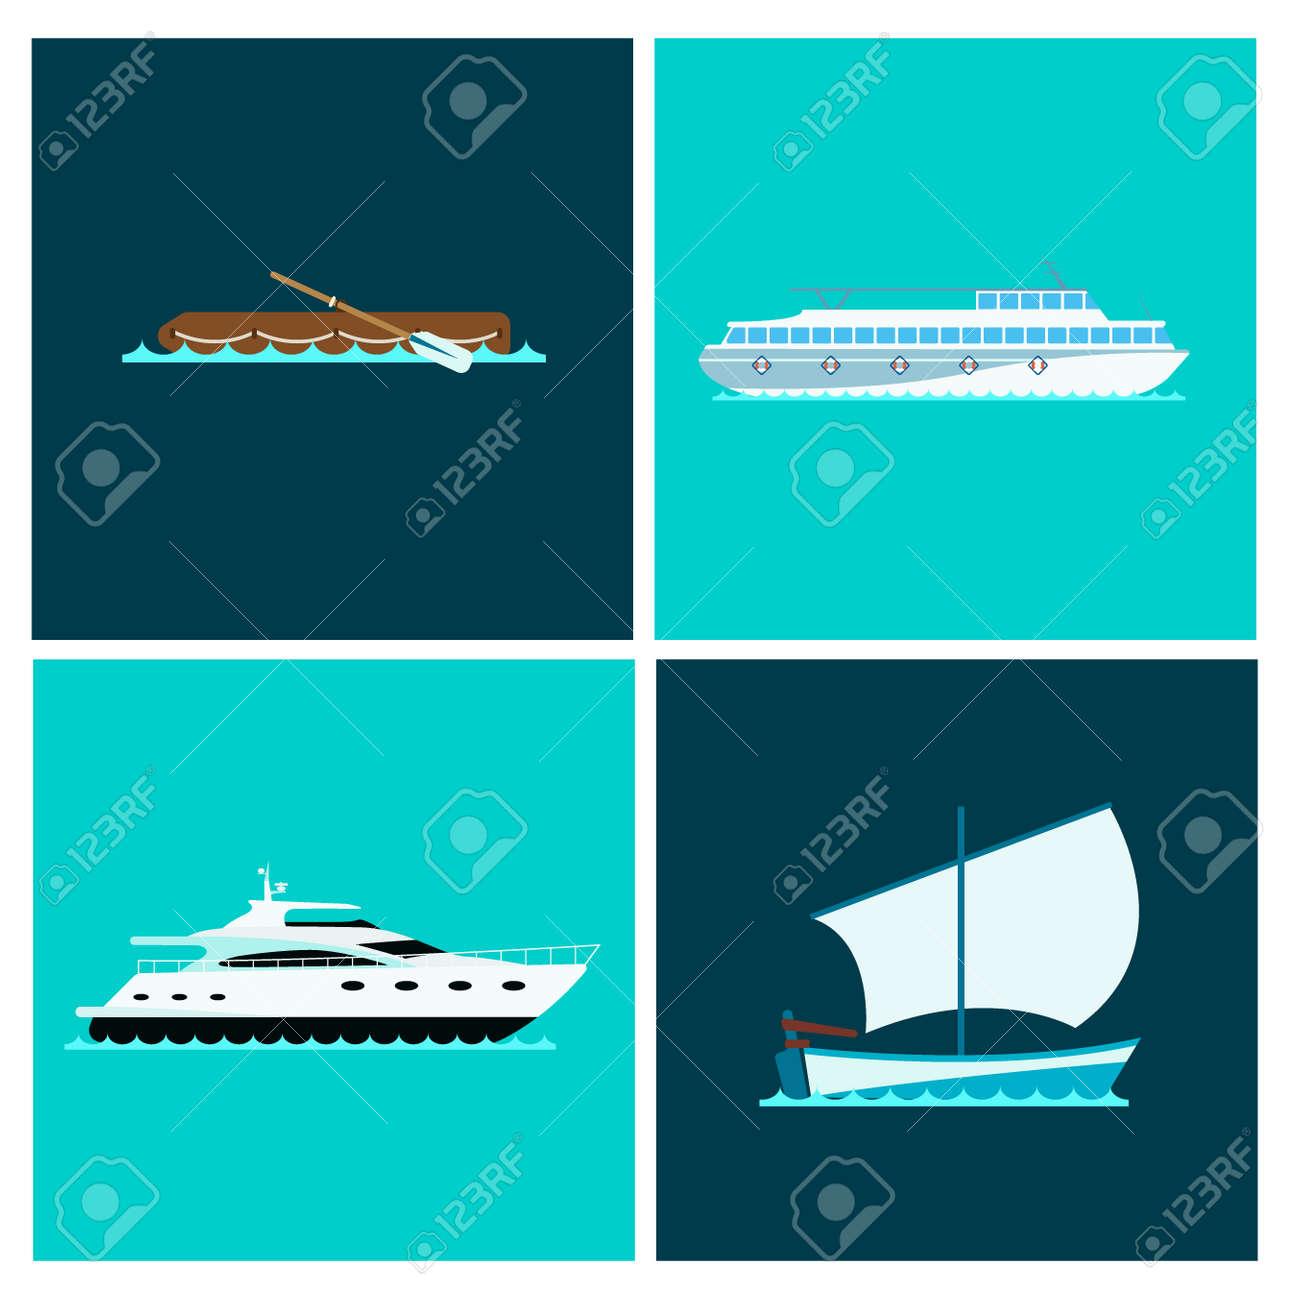 Ship Cruiser Boat Sea Brochure Vessel Travel Industry Vector - Cruise ship brochure